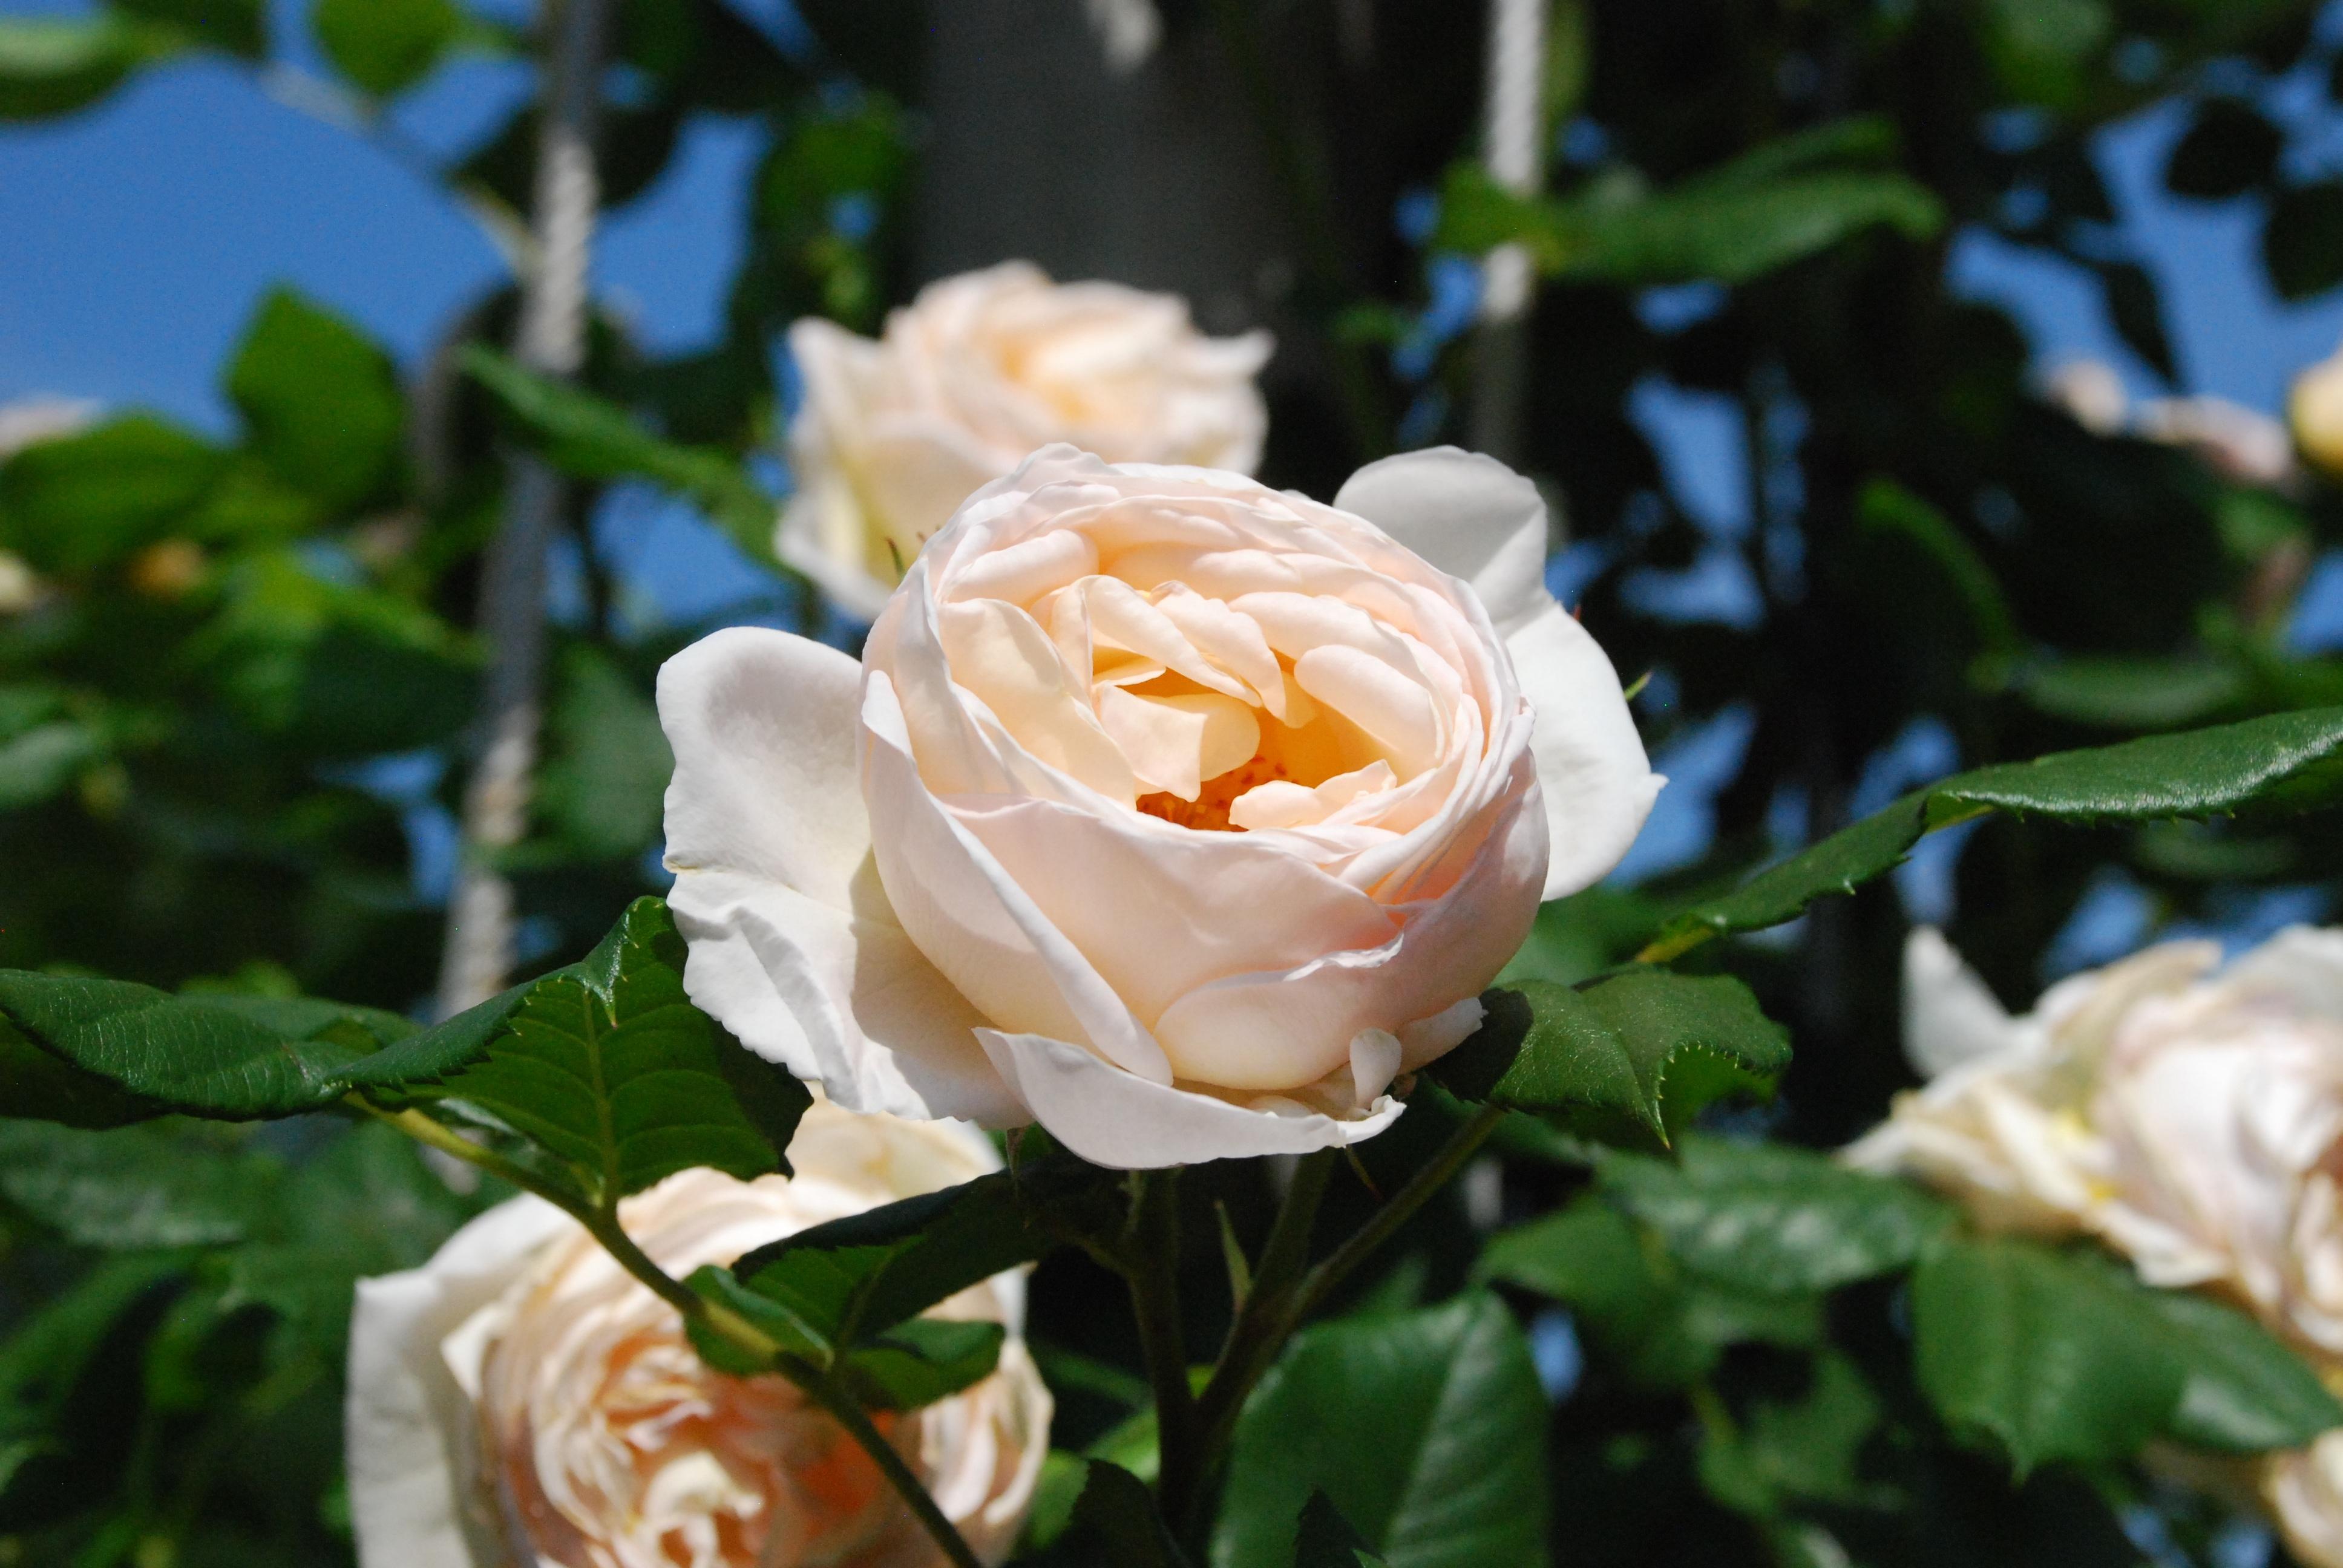 Gambar menanam daun bunga berkembang botani dekat flora keindahan harum budidaya bunga floribunda kacapiring naik mekar mawar putih